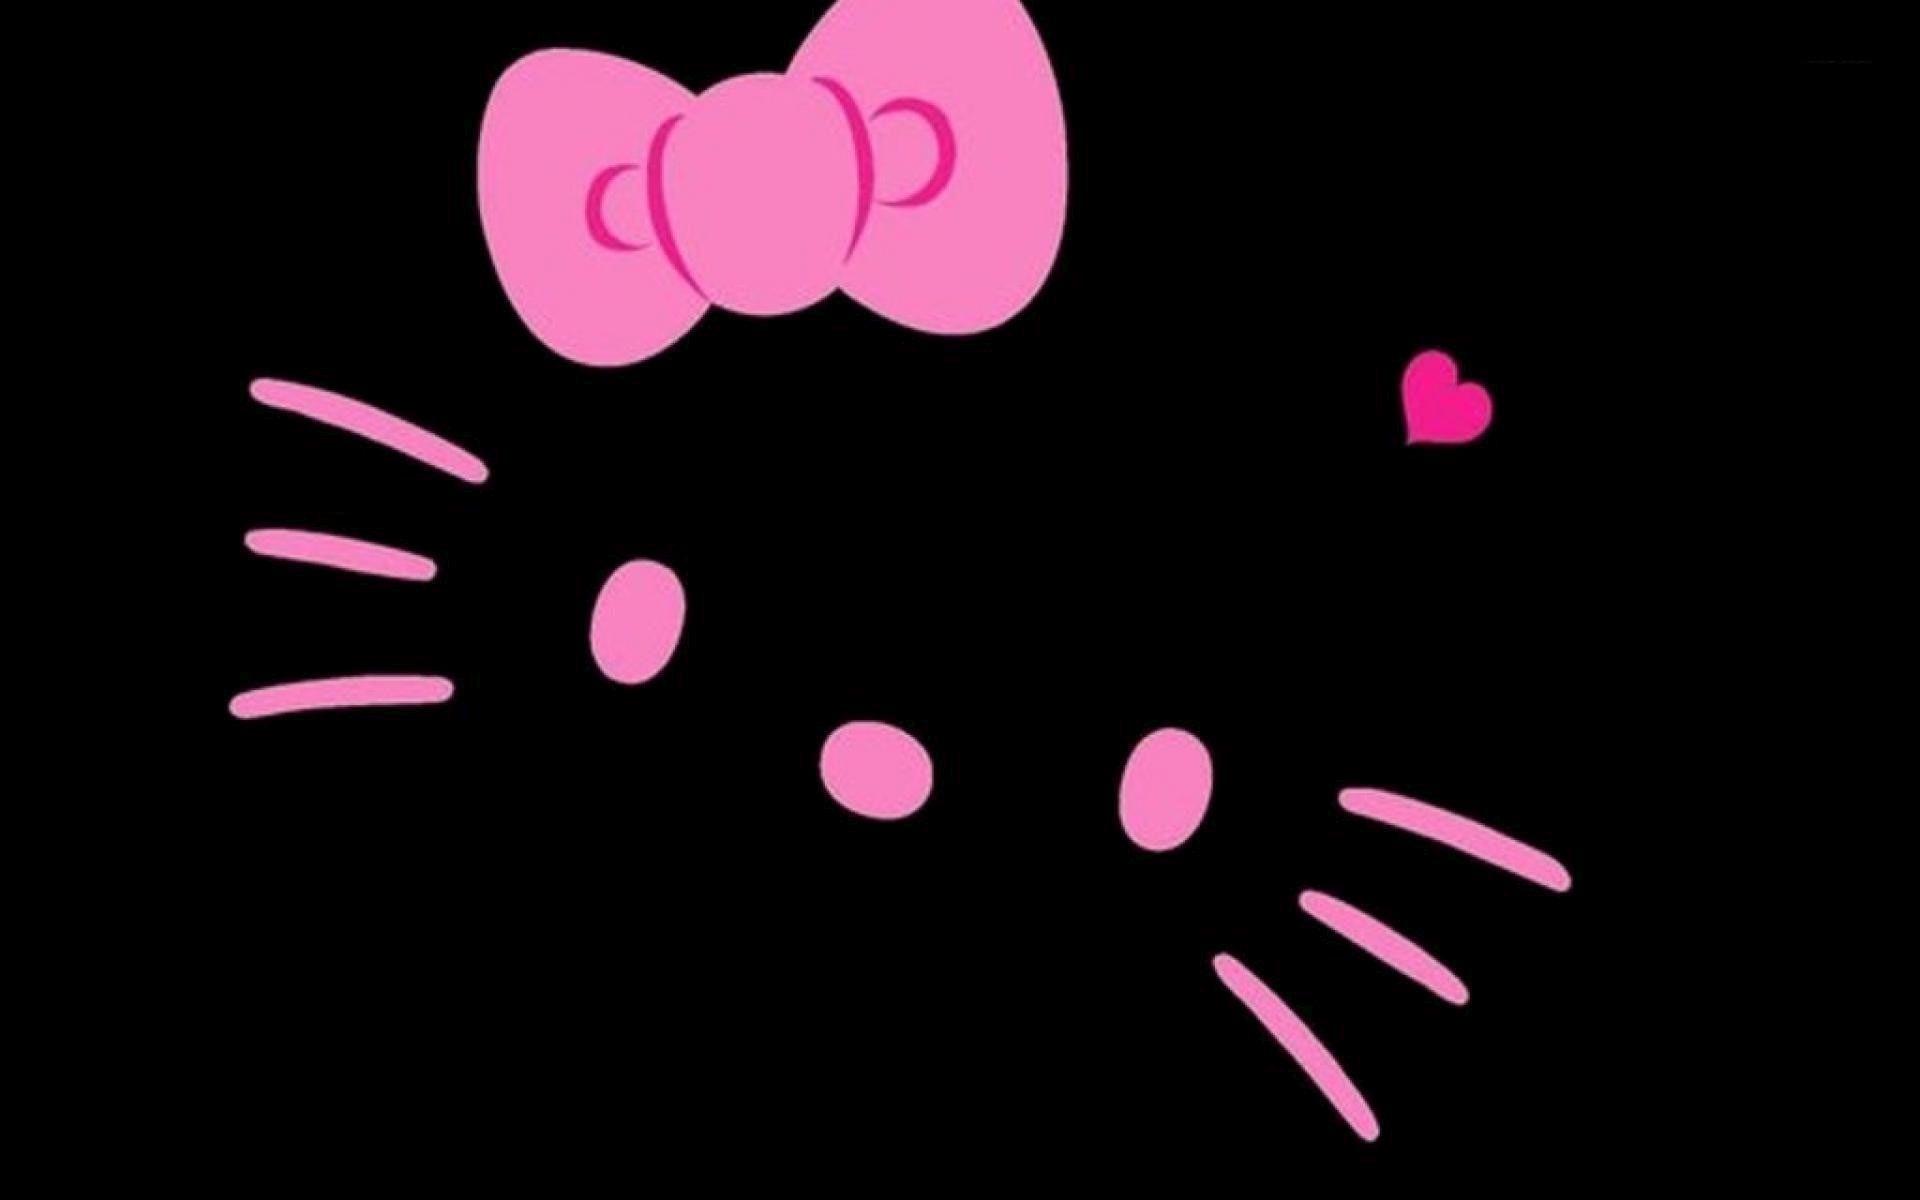 Beautiful Wallpaper Hello Kitty Head - iapFuJ  Snapshot_635664.jpg